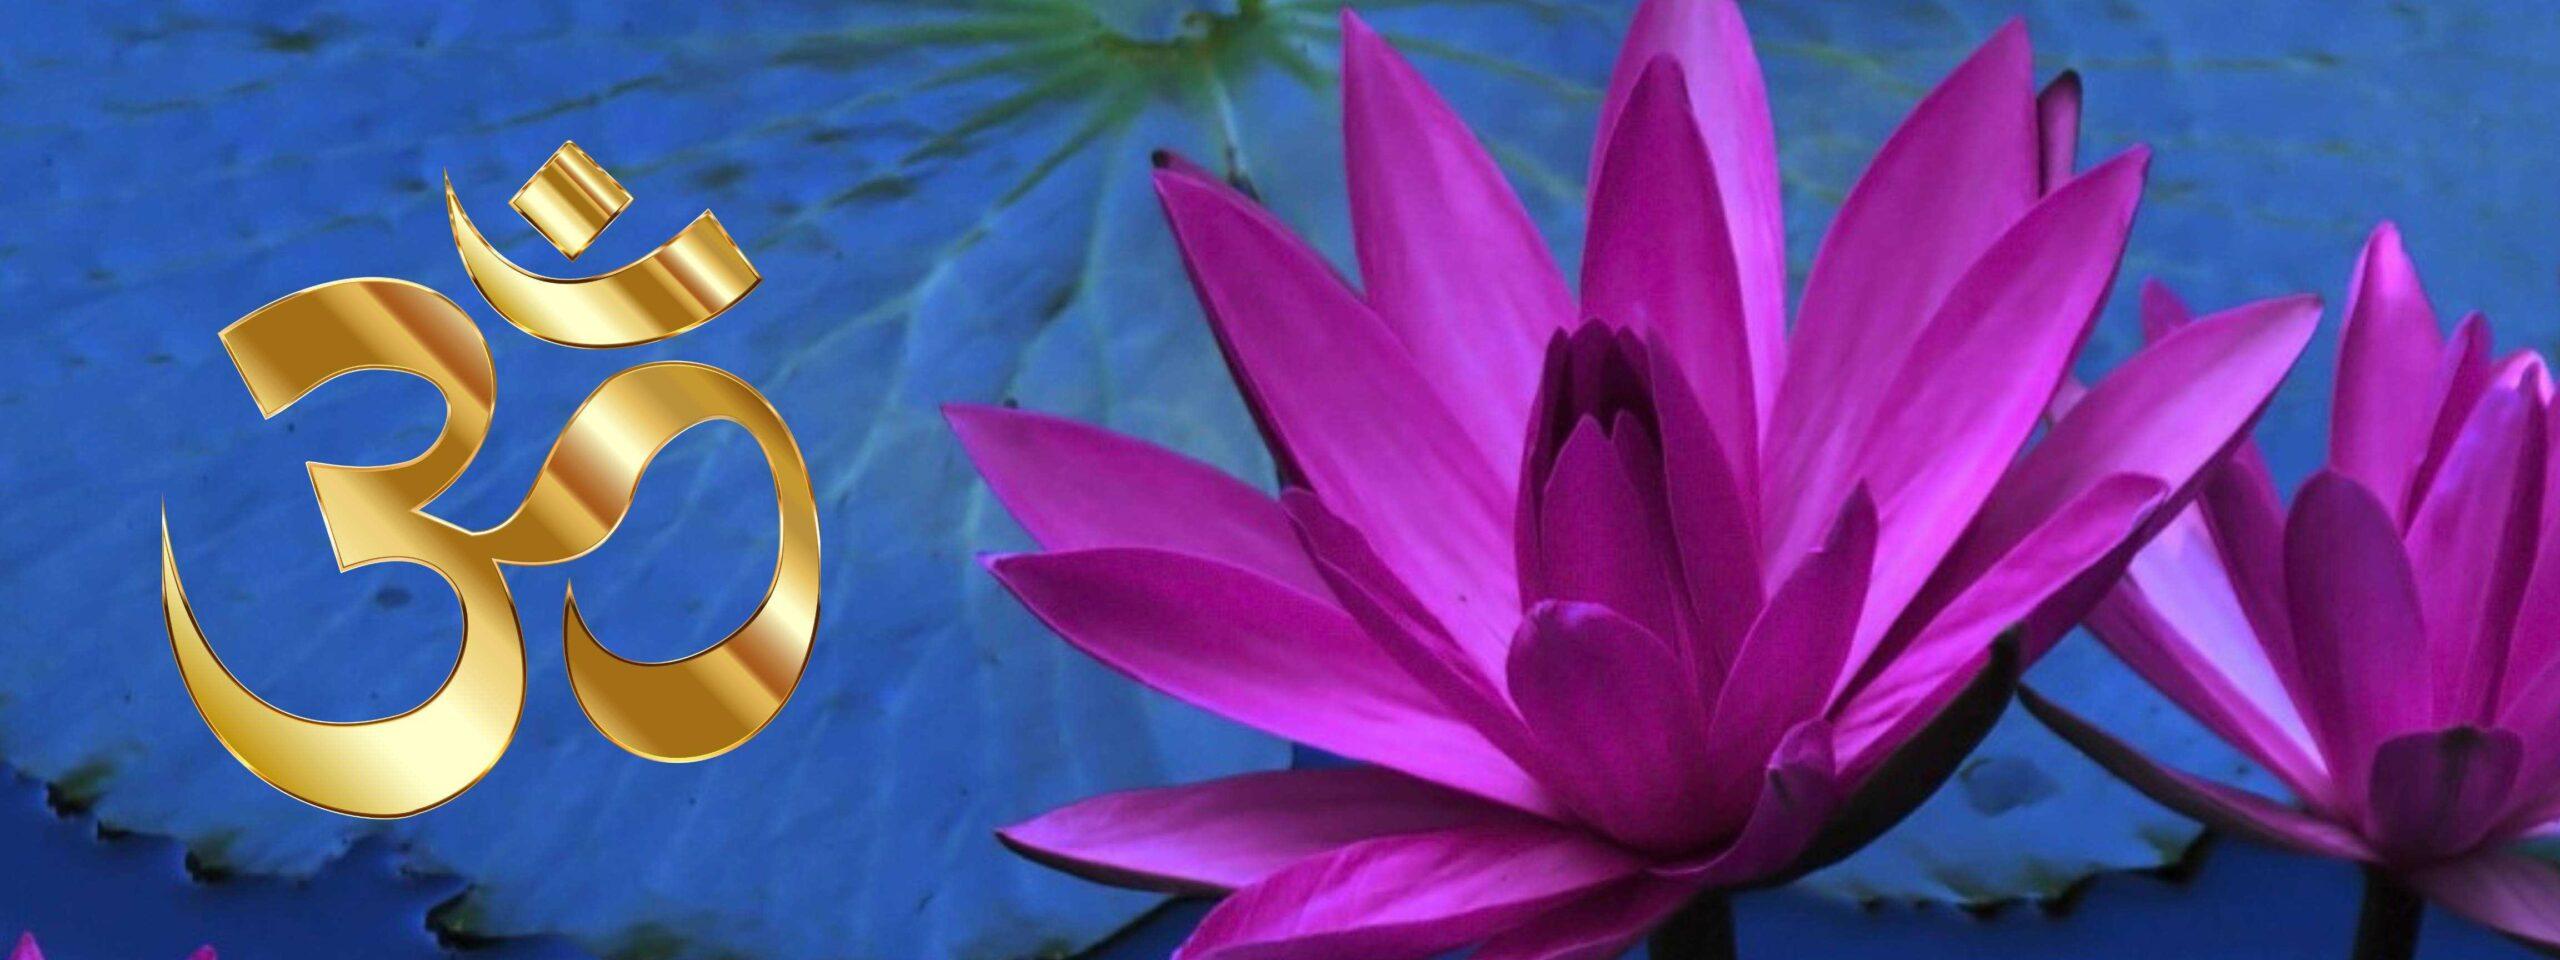 Lotusblume Violett